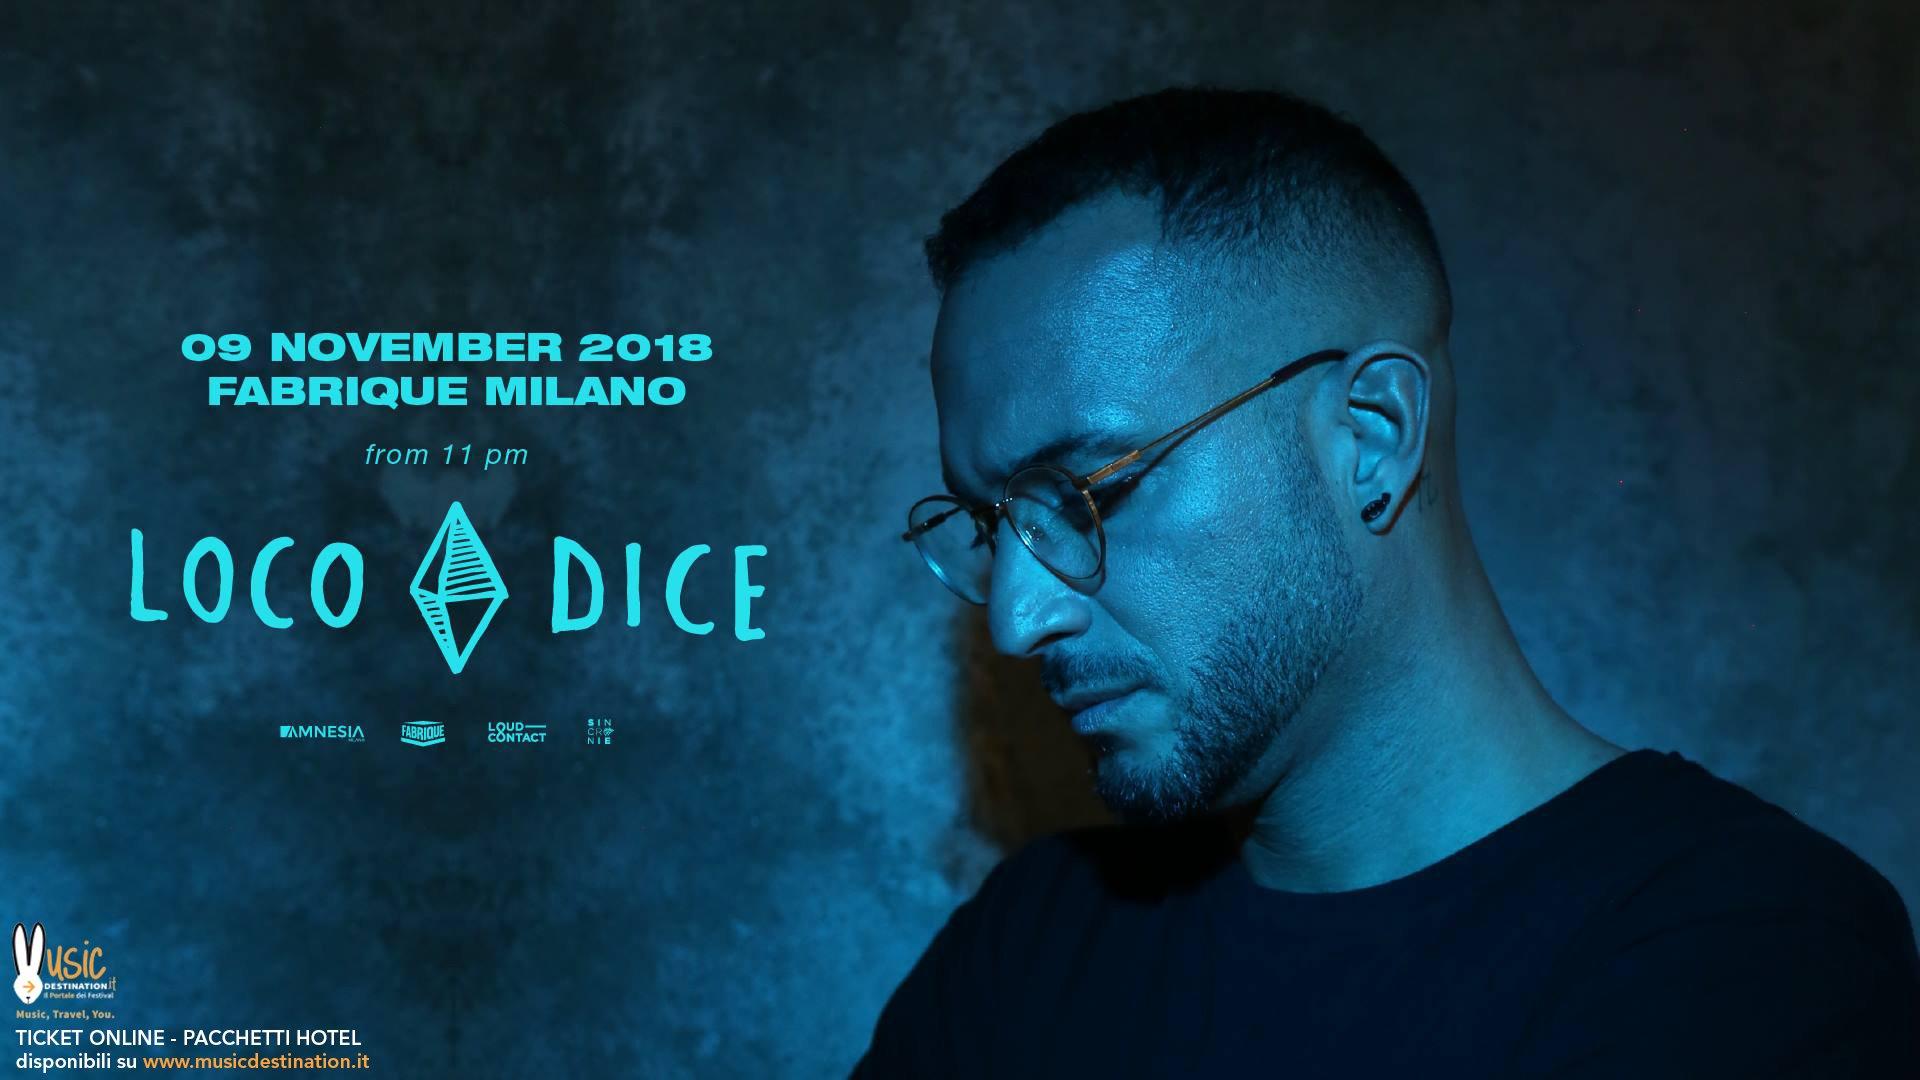 Loco Dice Fabrique Milano 09 Novembre 2018